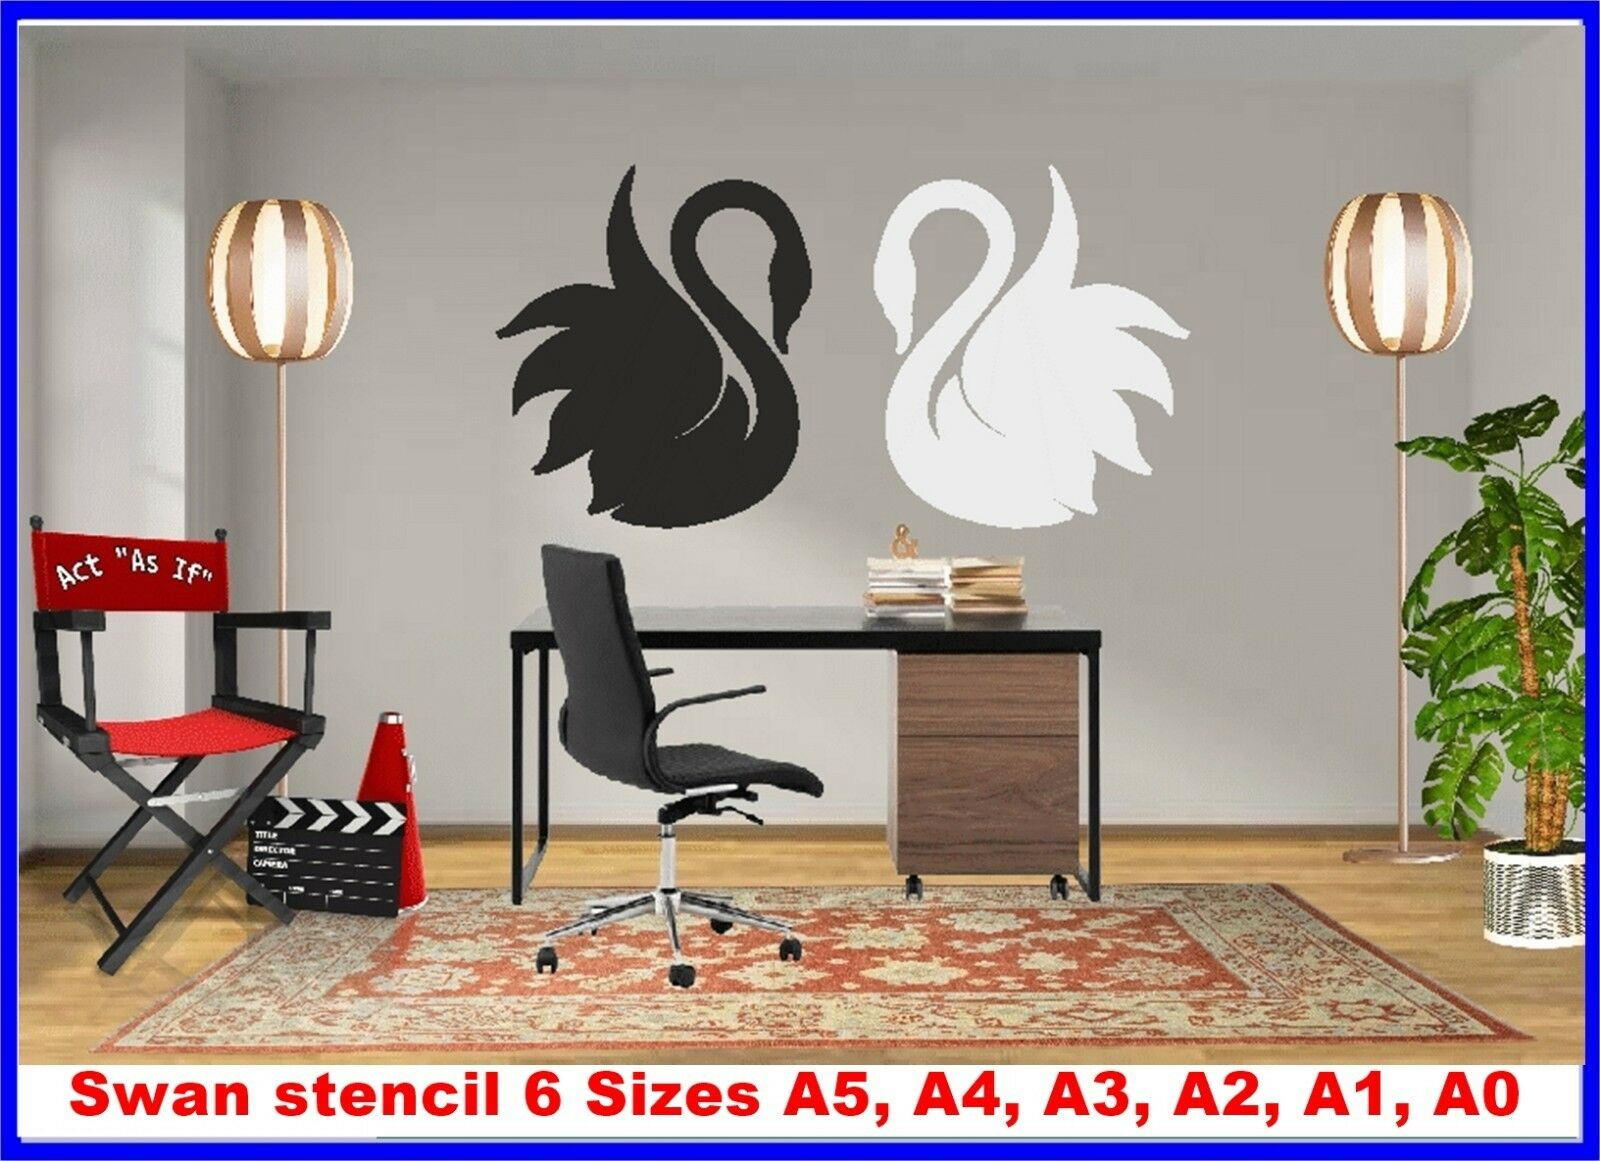 Swan Reusable Stencil 6 Größes A5 to A0 350 micron Mylar not thin stuff SWAN01